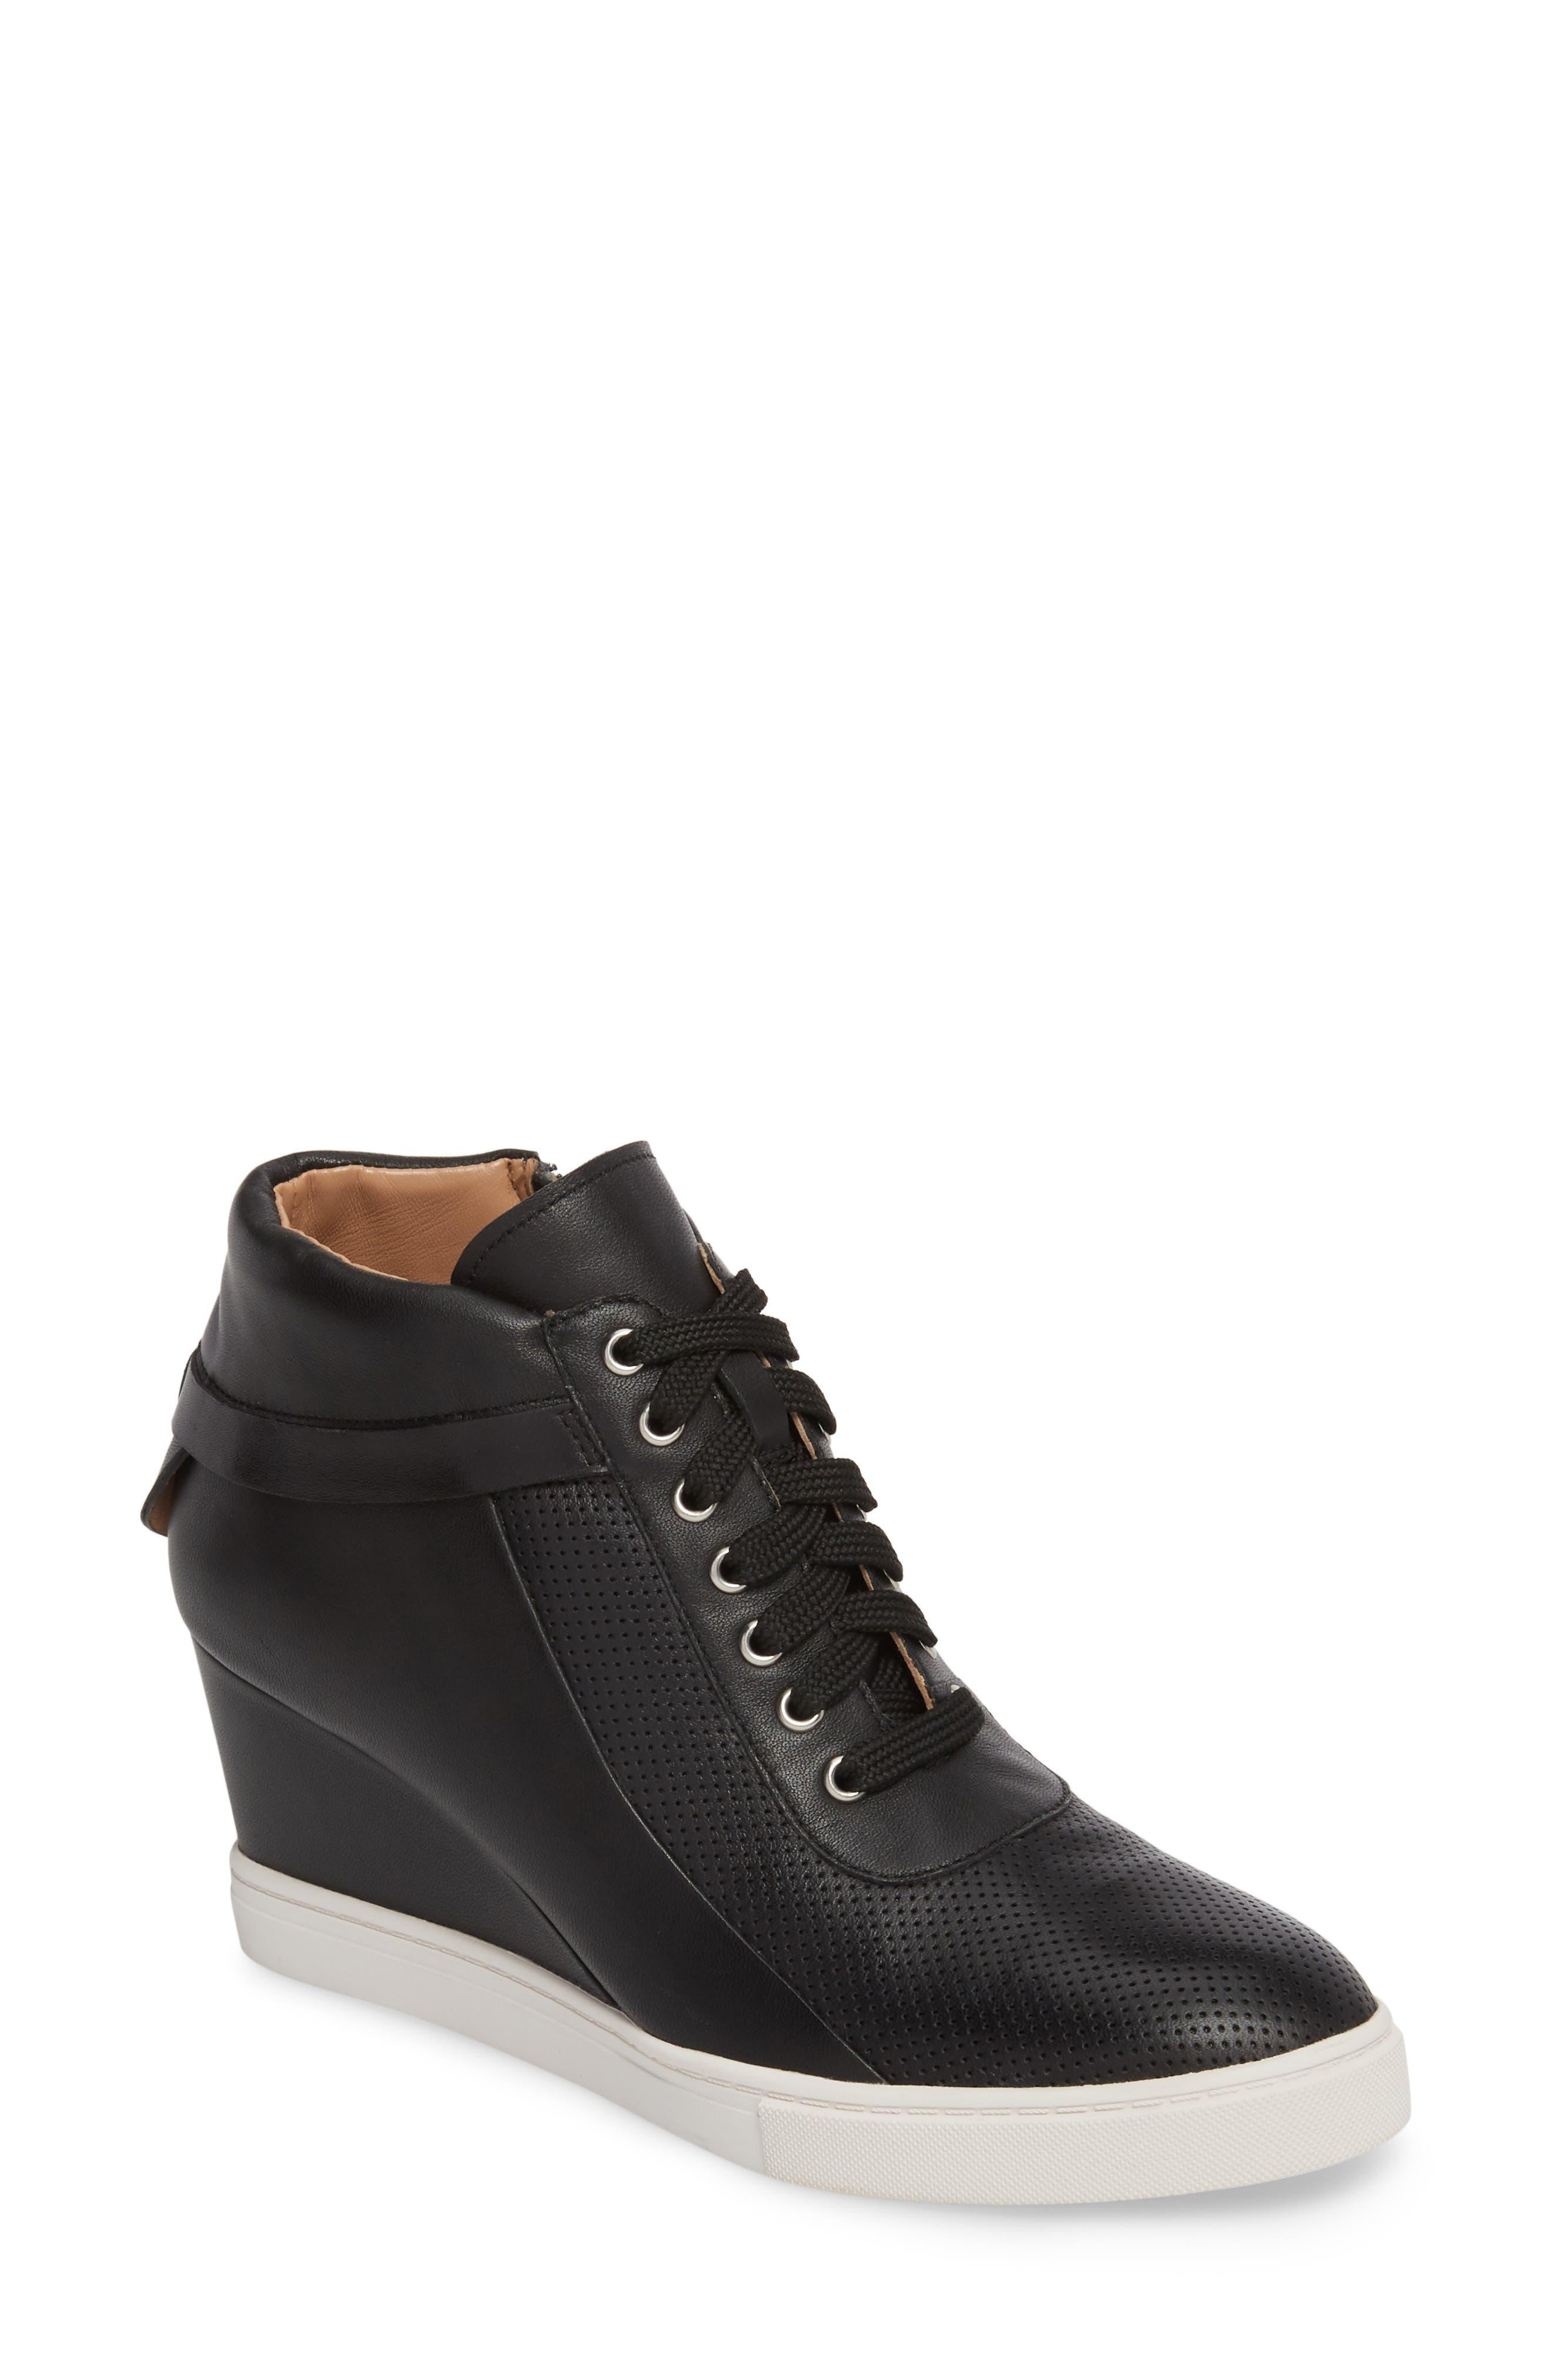 Freja Wedge Sneaker,                         Main,                         color, BLACK LEATHER